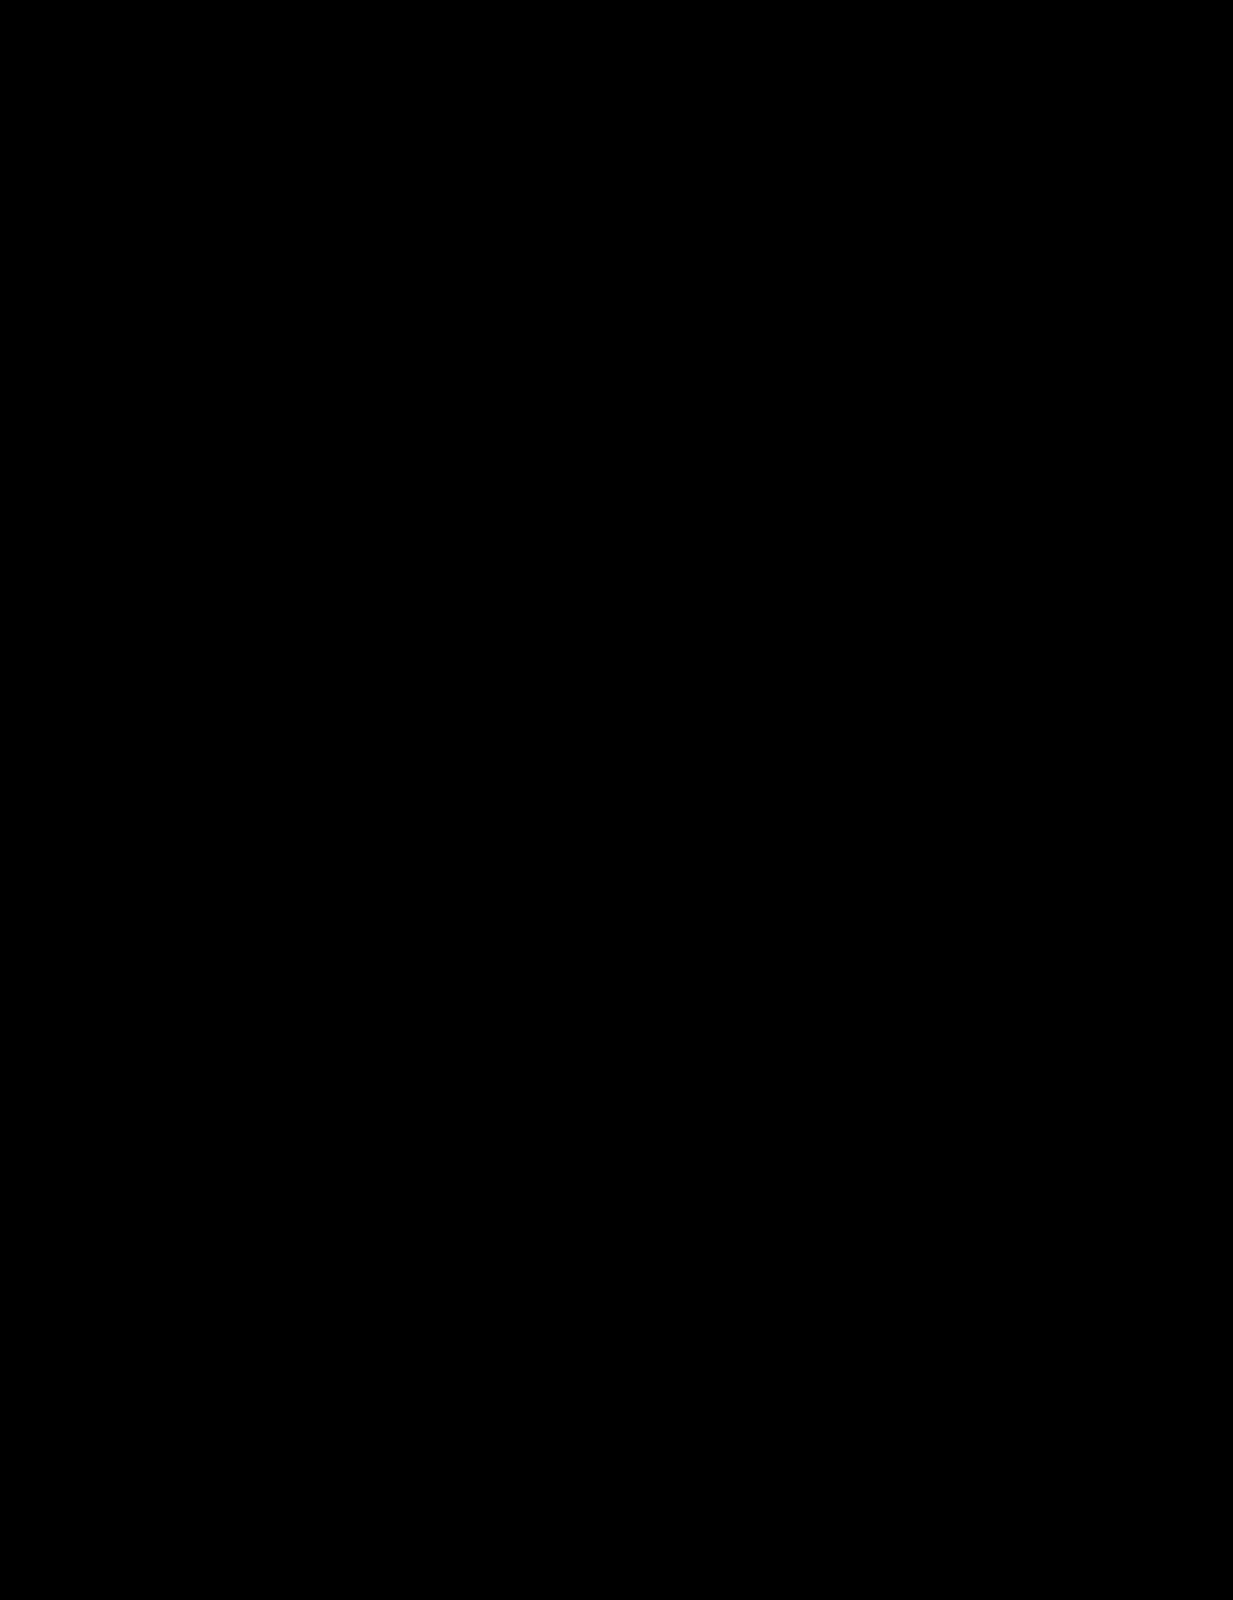 Black Frame Borders Designs